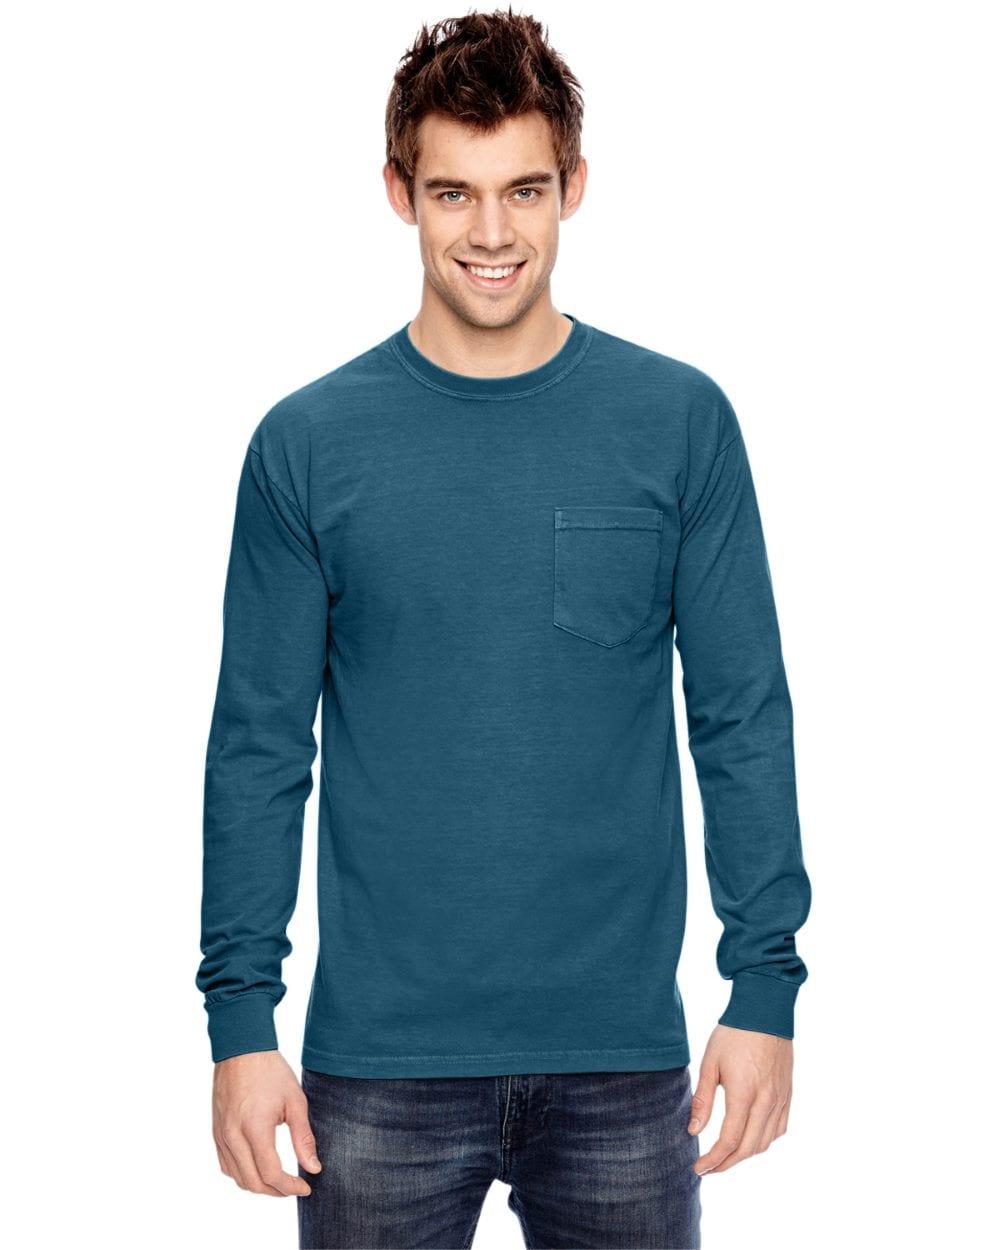 77559aa0 comfort colors c4410 heavyweight RS custom long sleeve pocket t shirt topaz  blue